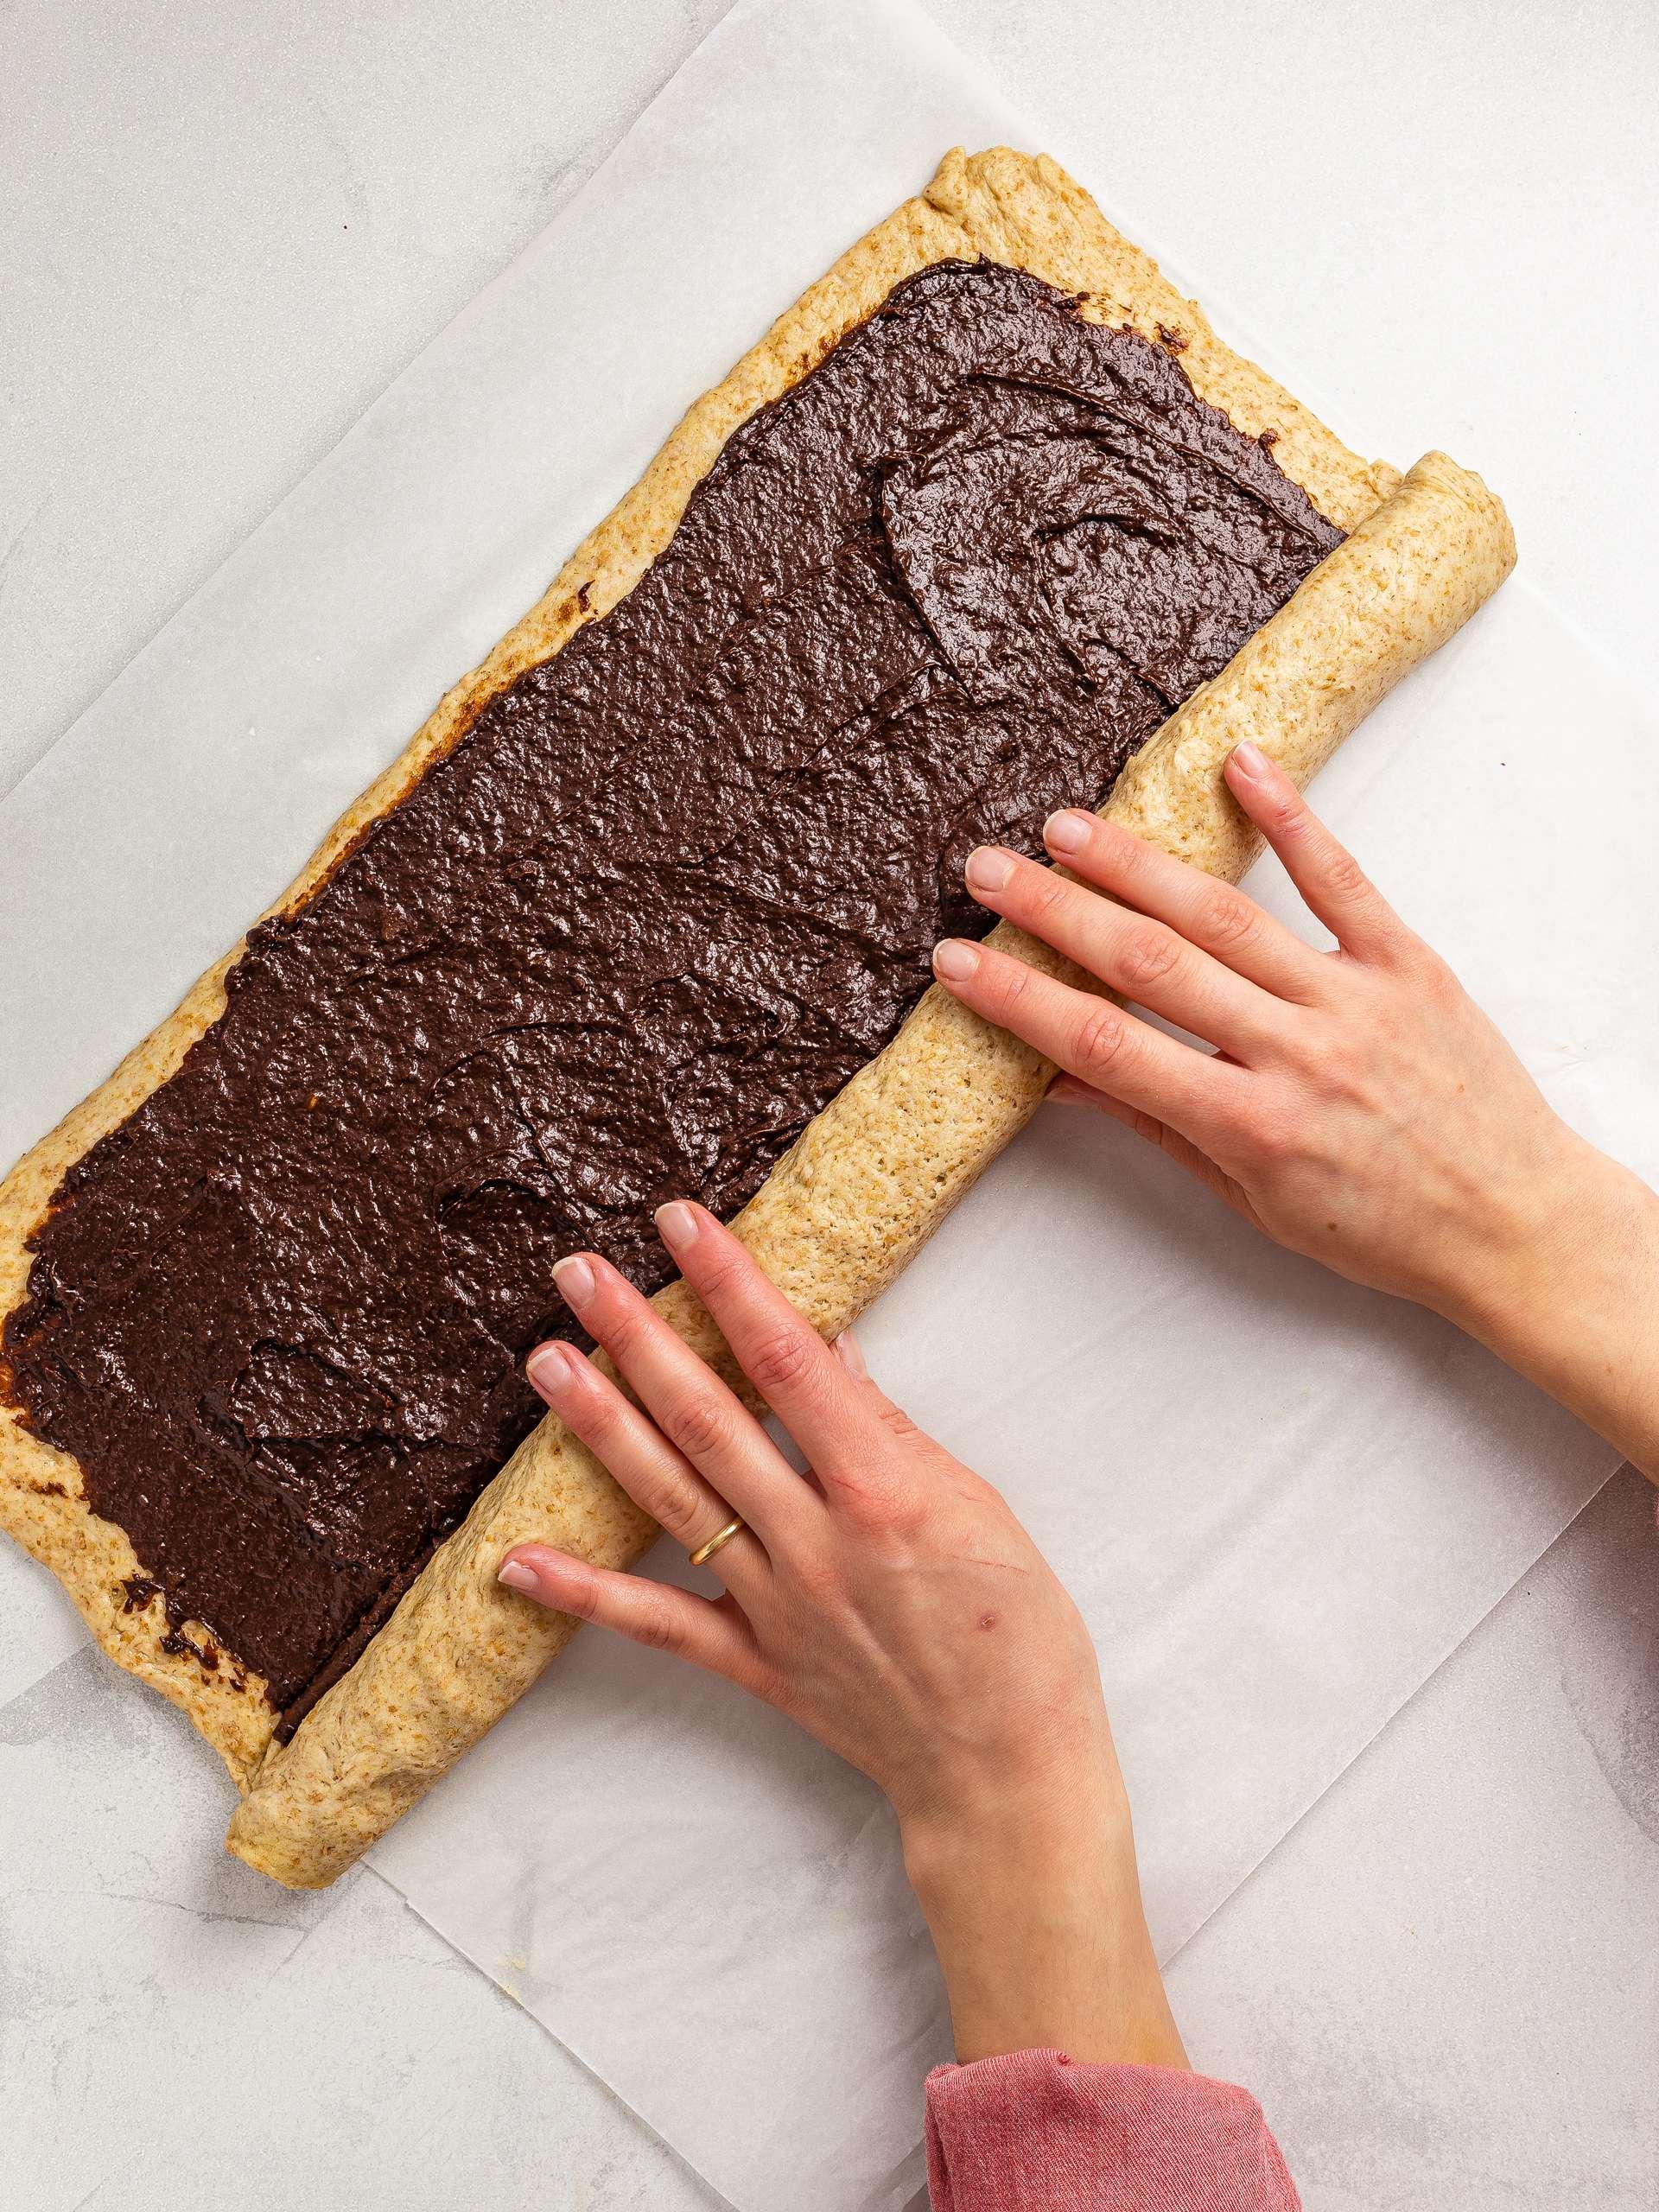 rolling the krantz cake dough around the chocolate filing